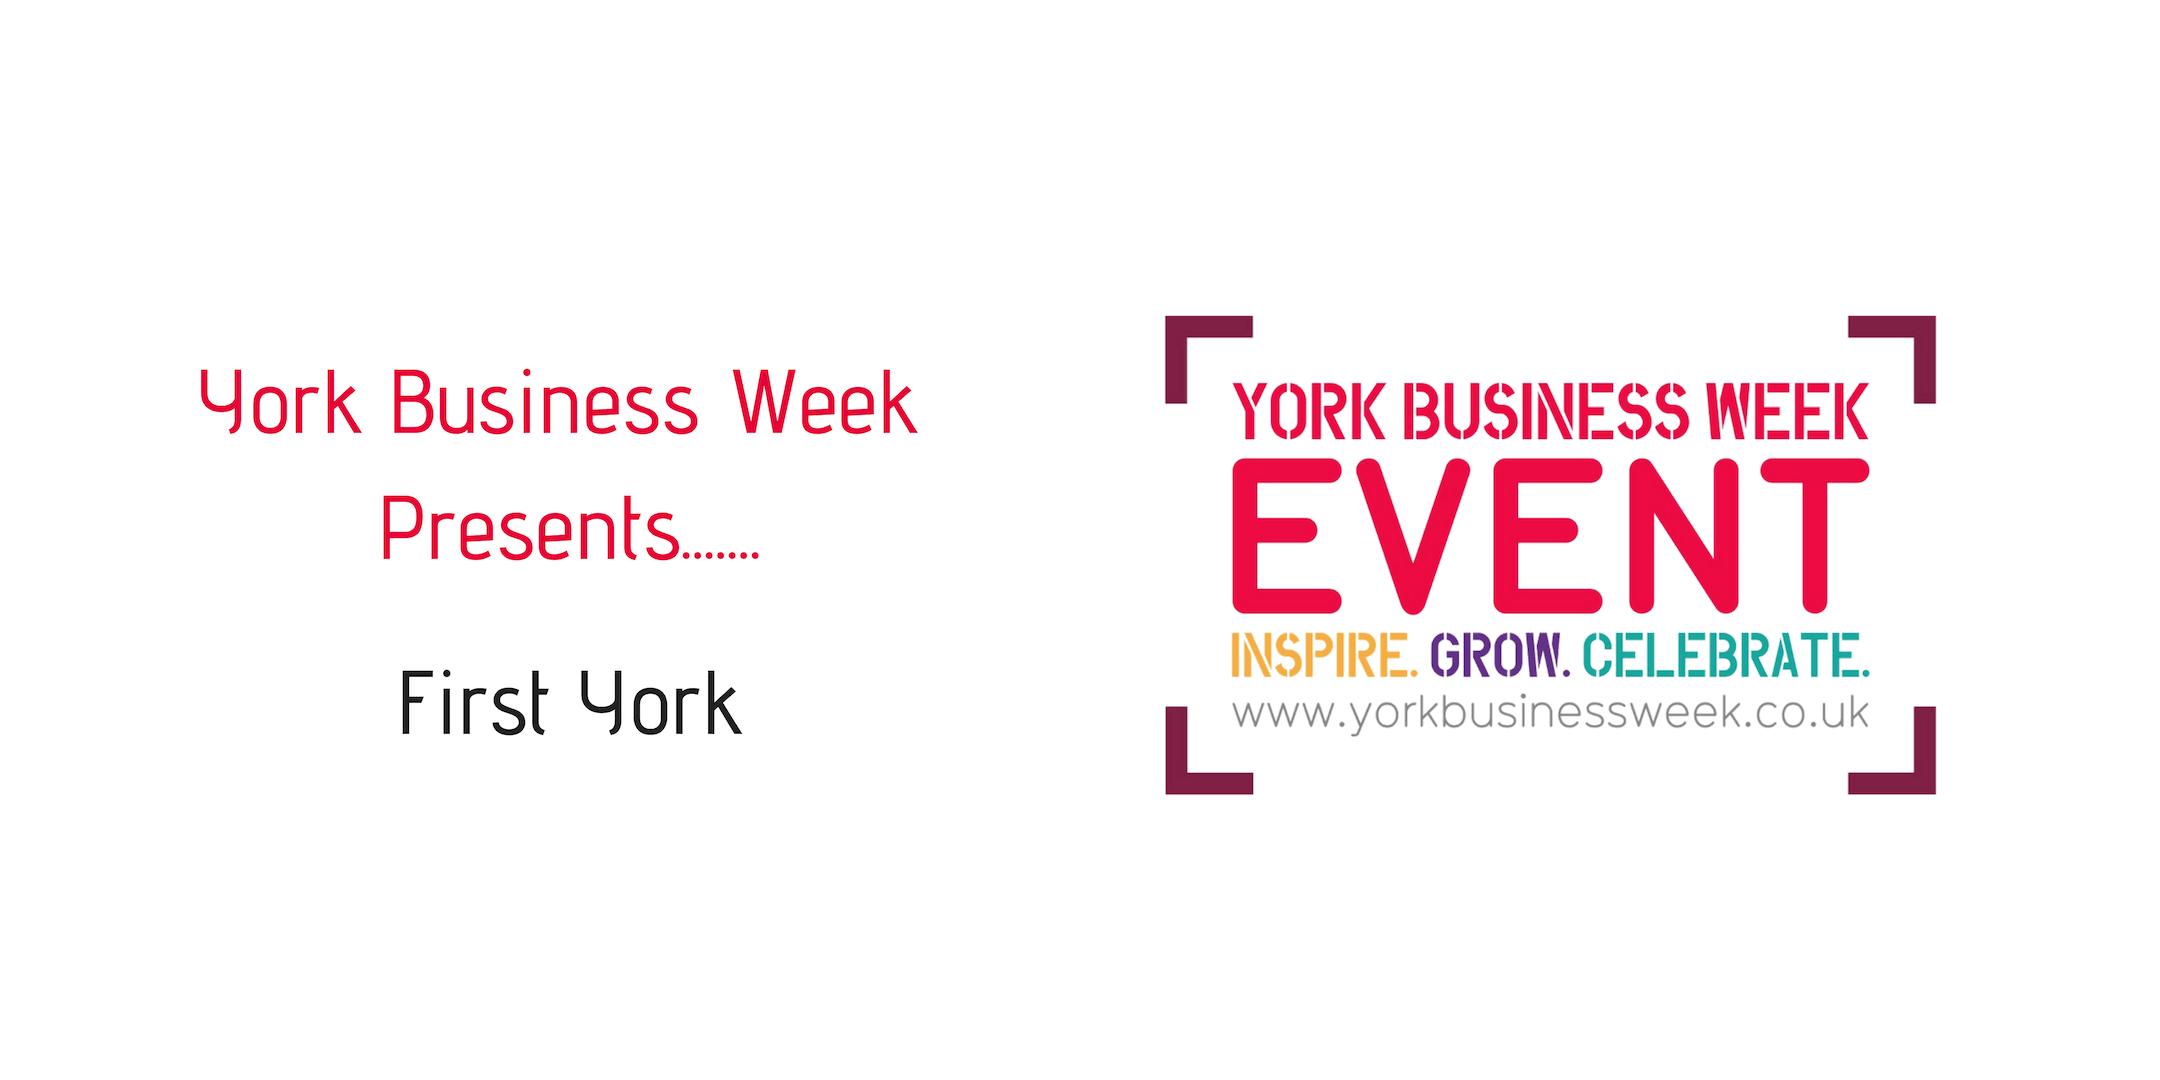 York Business Week Presents.....First York